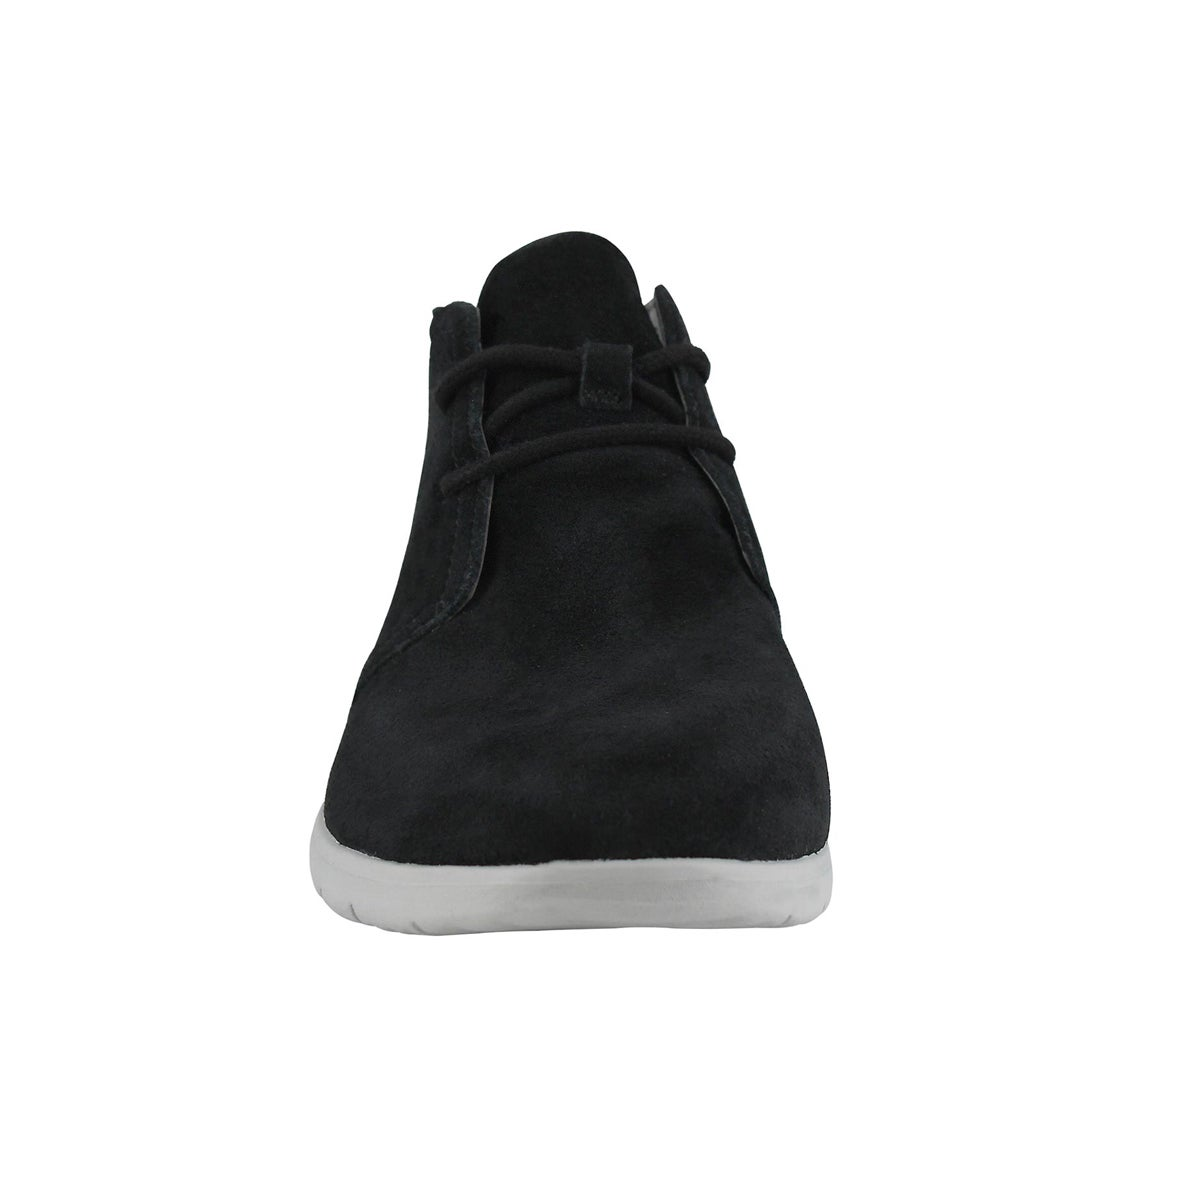 Men's DUSTIN black chukka boots